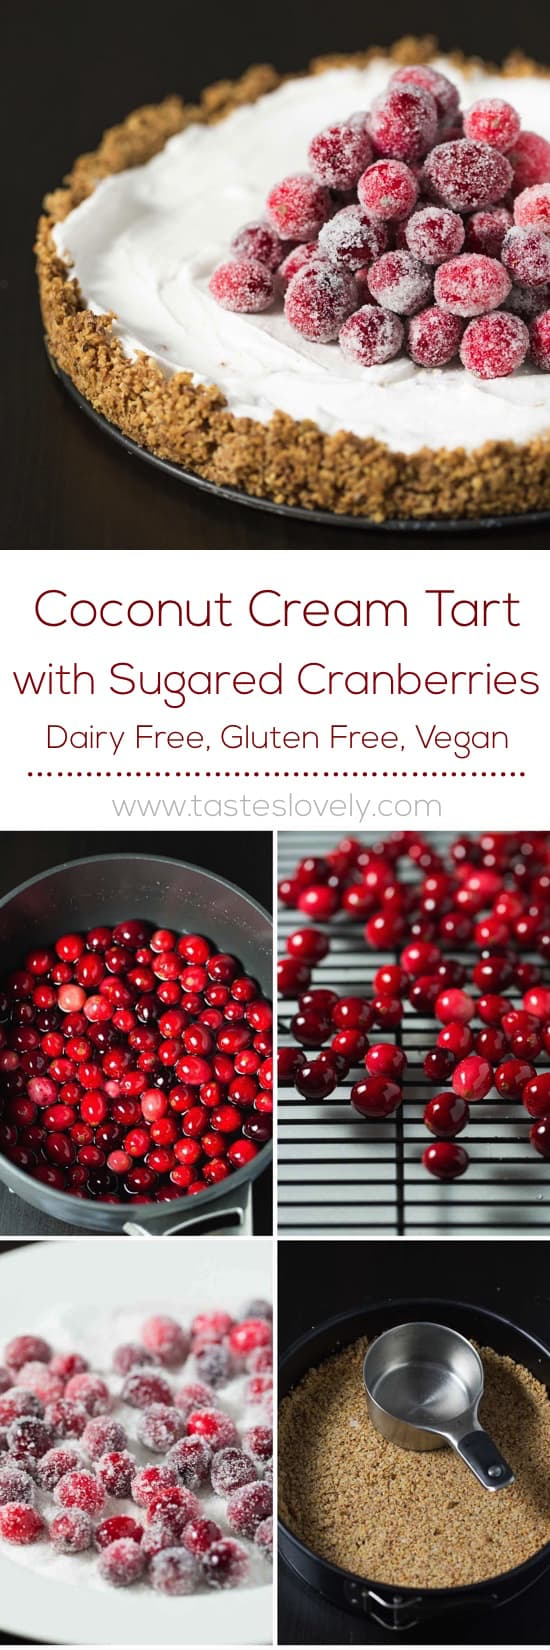 Coconut Cream Tart with Sugared Cranberries - Dairy Free, Vegan, Gluten Free